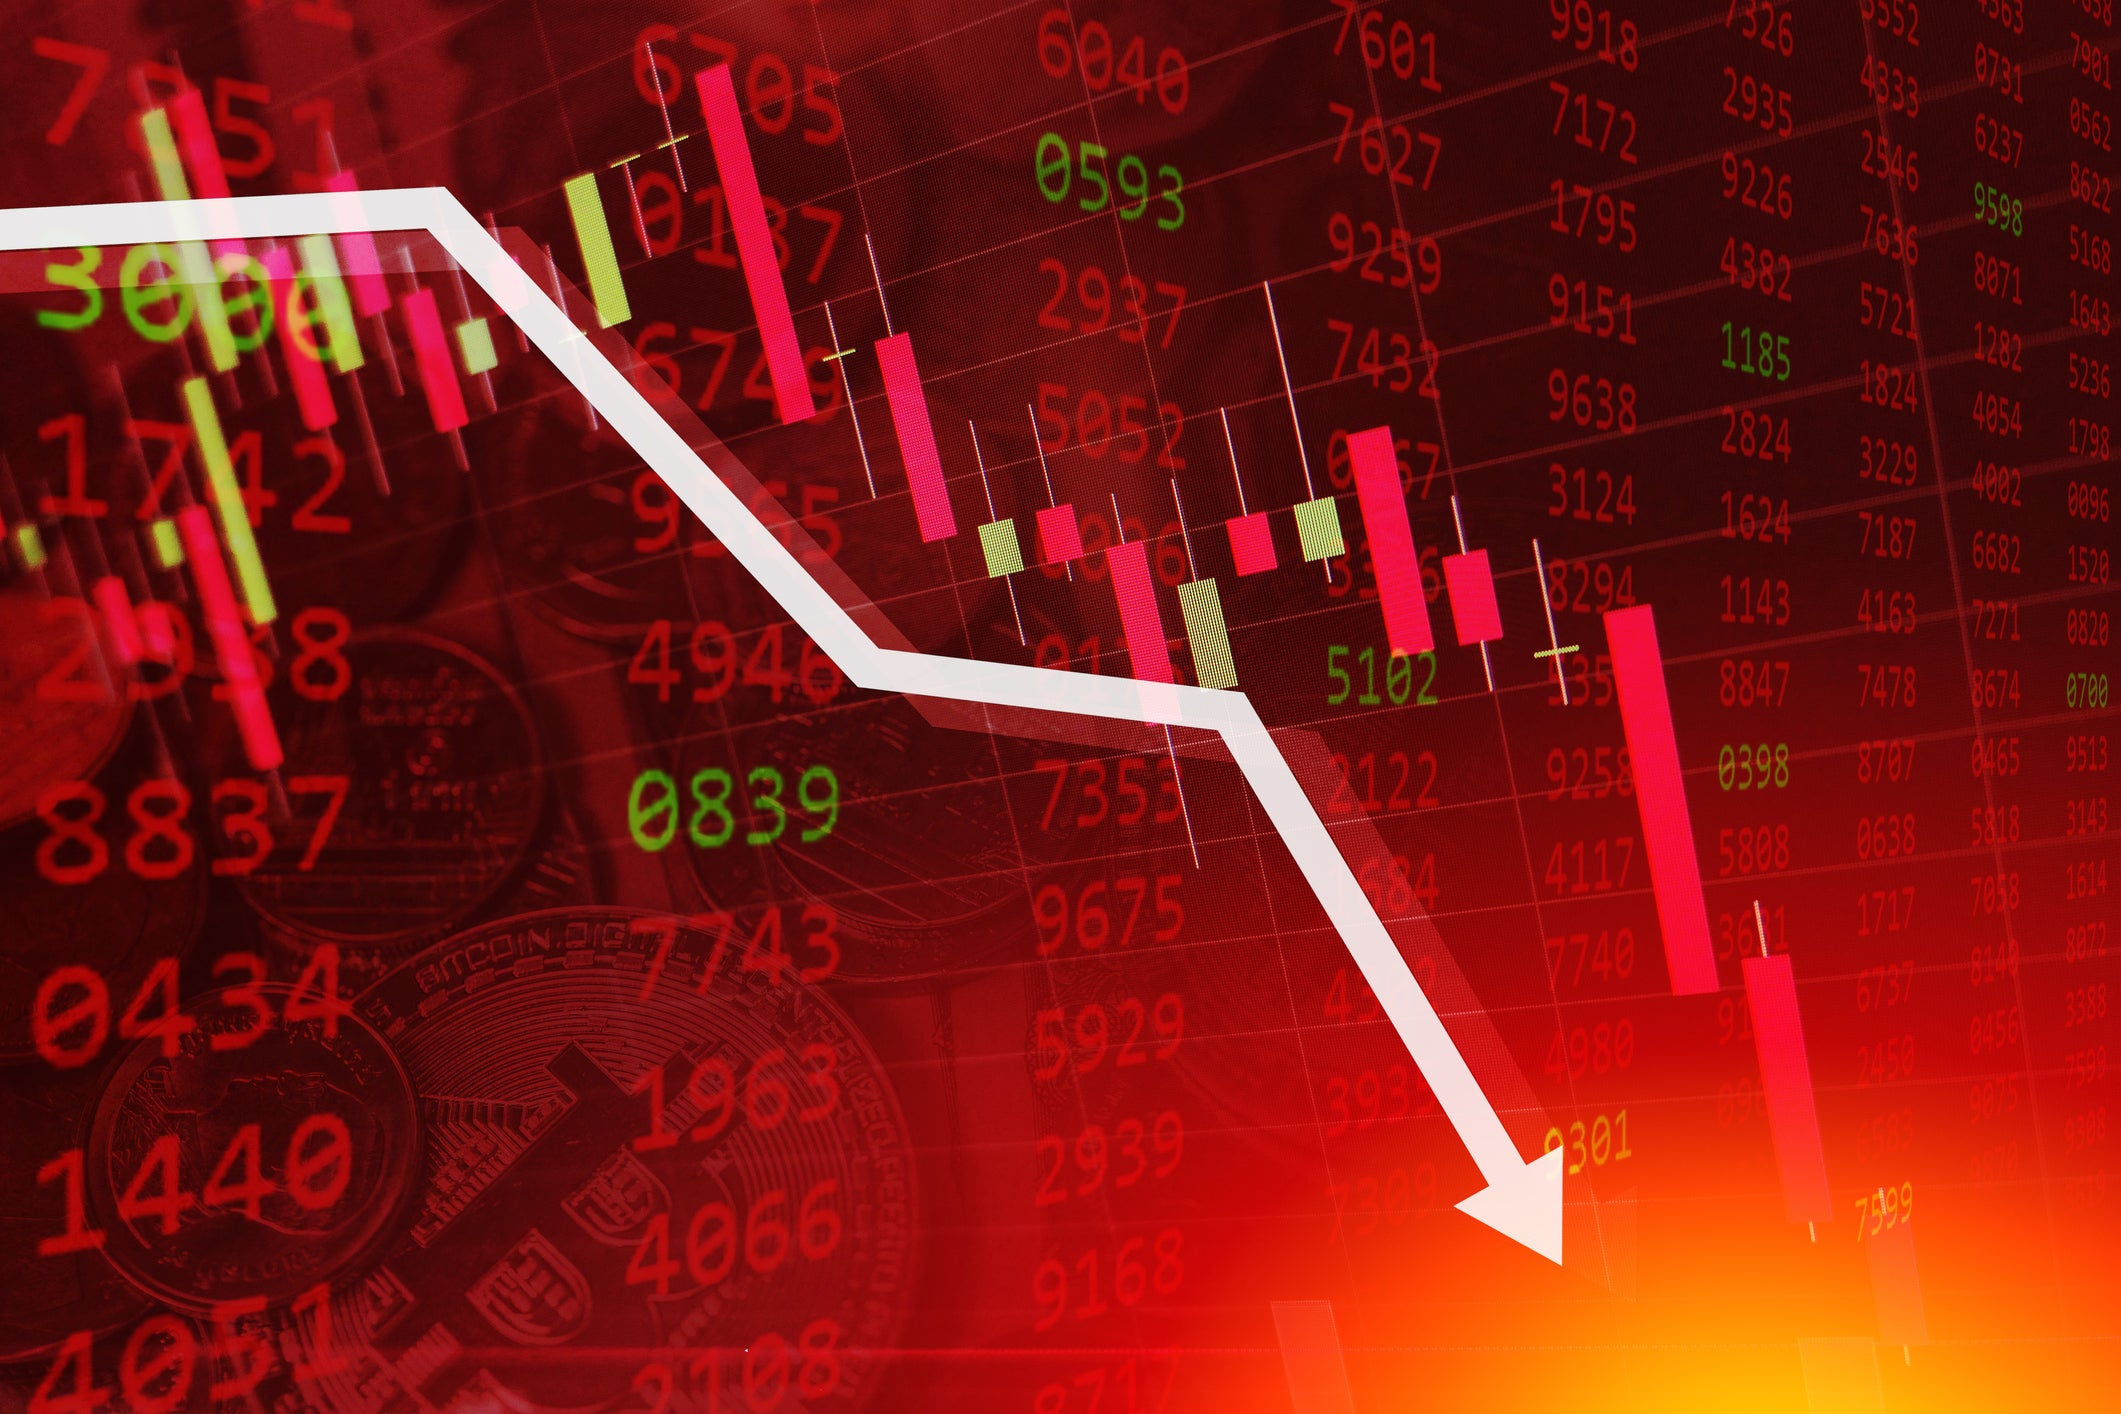 Why Tesla Stock Dropped on Monday